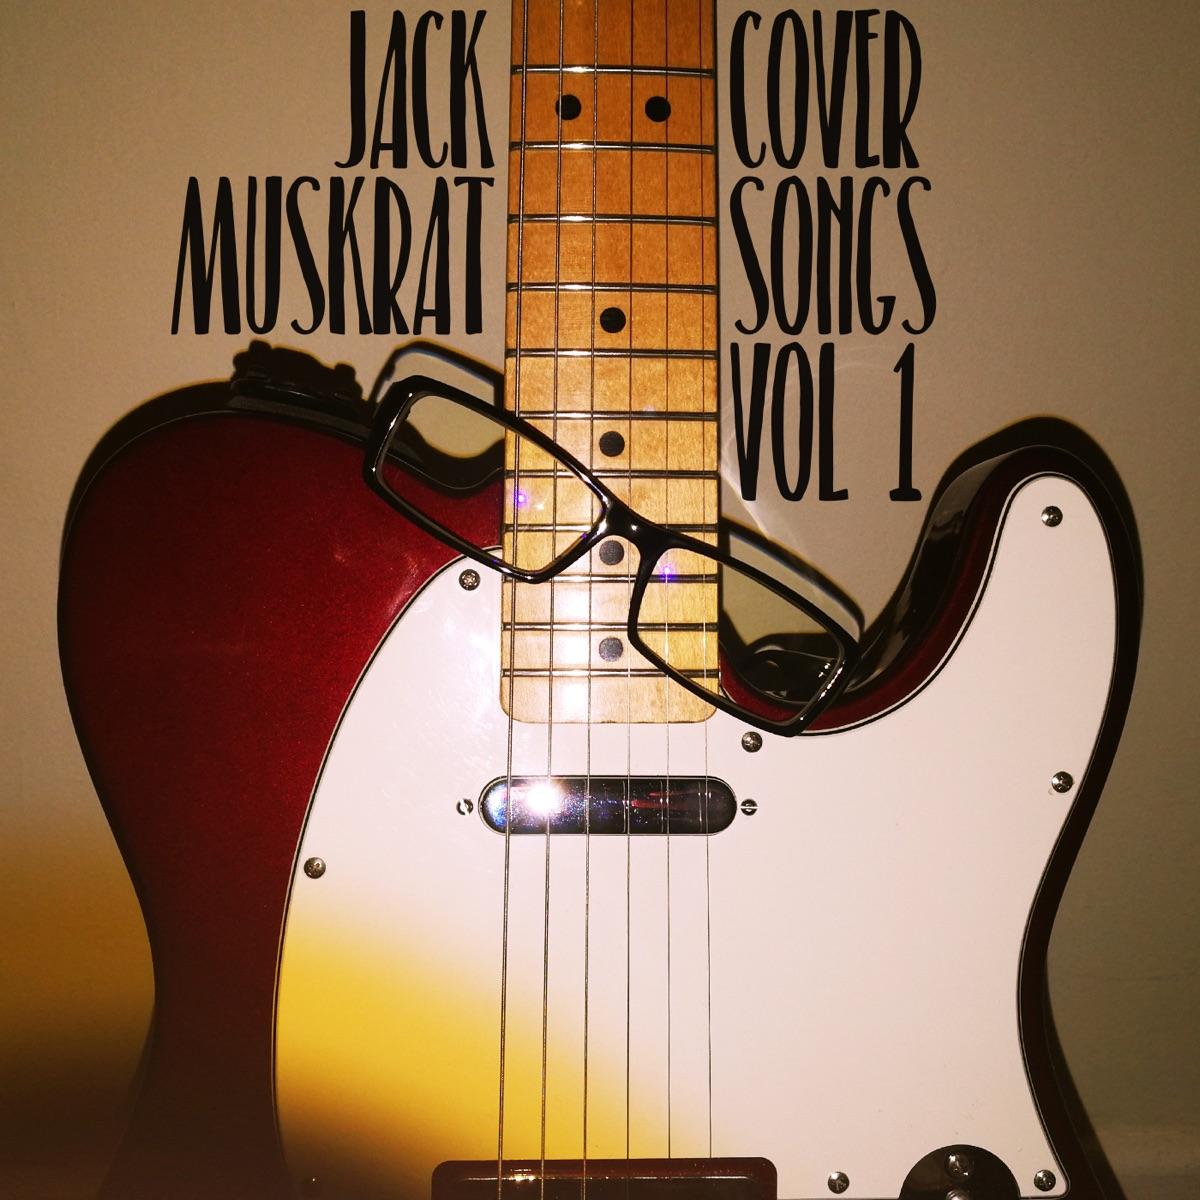 Cover Songs Vol 1 Jack Muskrat CD cover